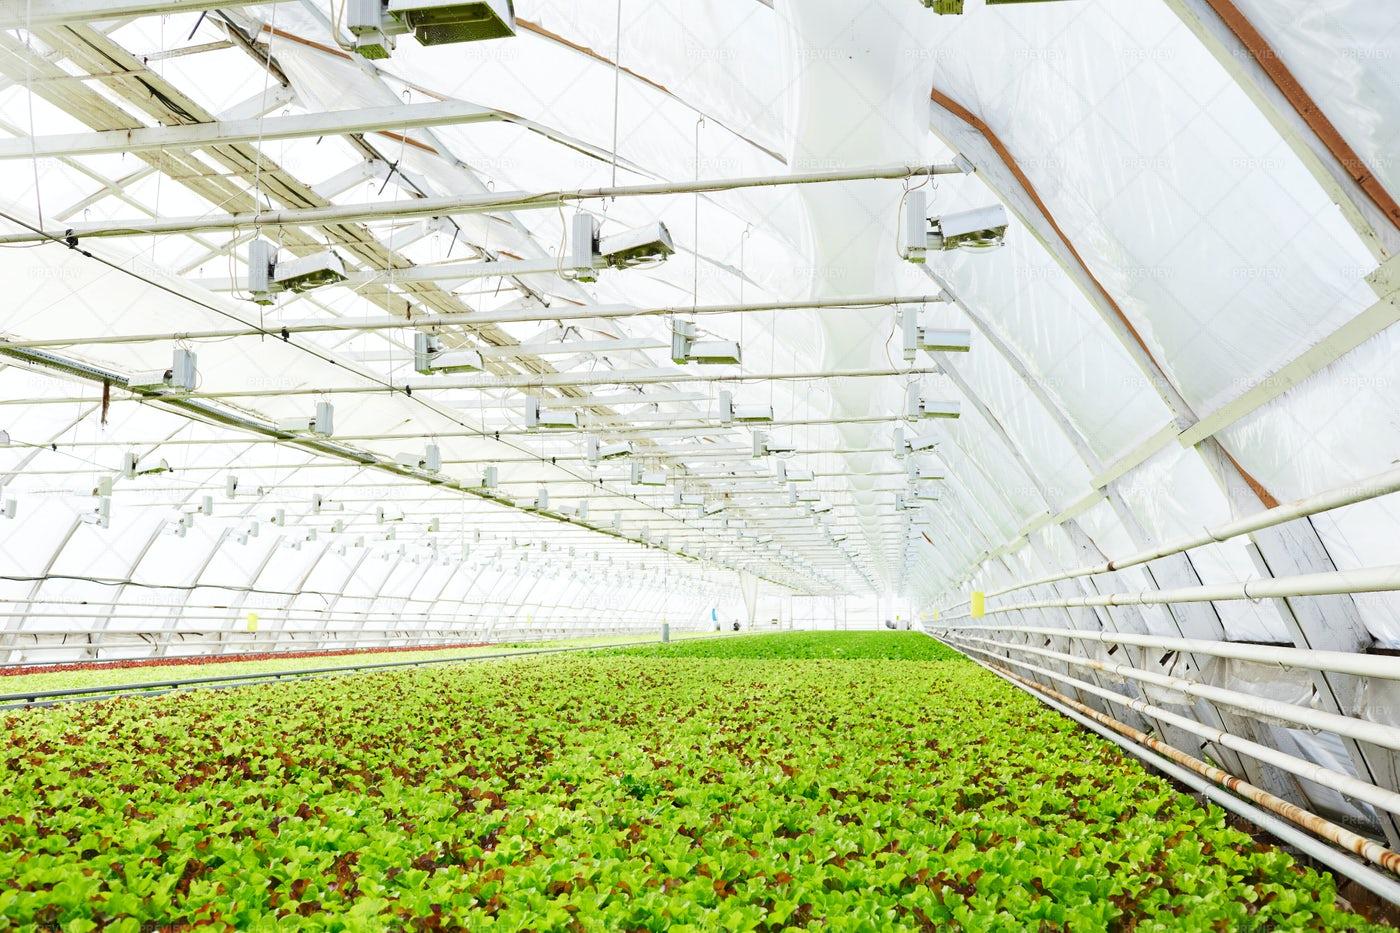 Commercial Lettuce Production: Stock Photos